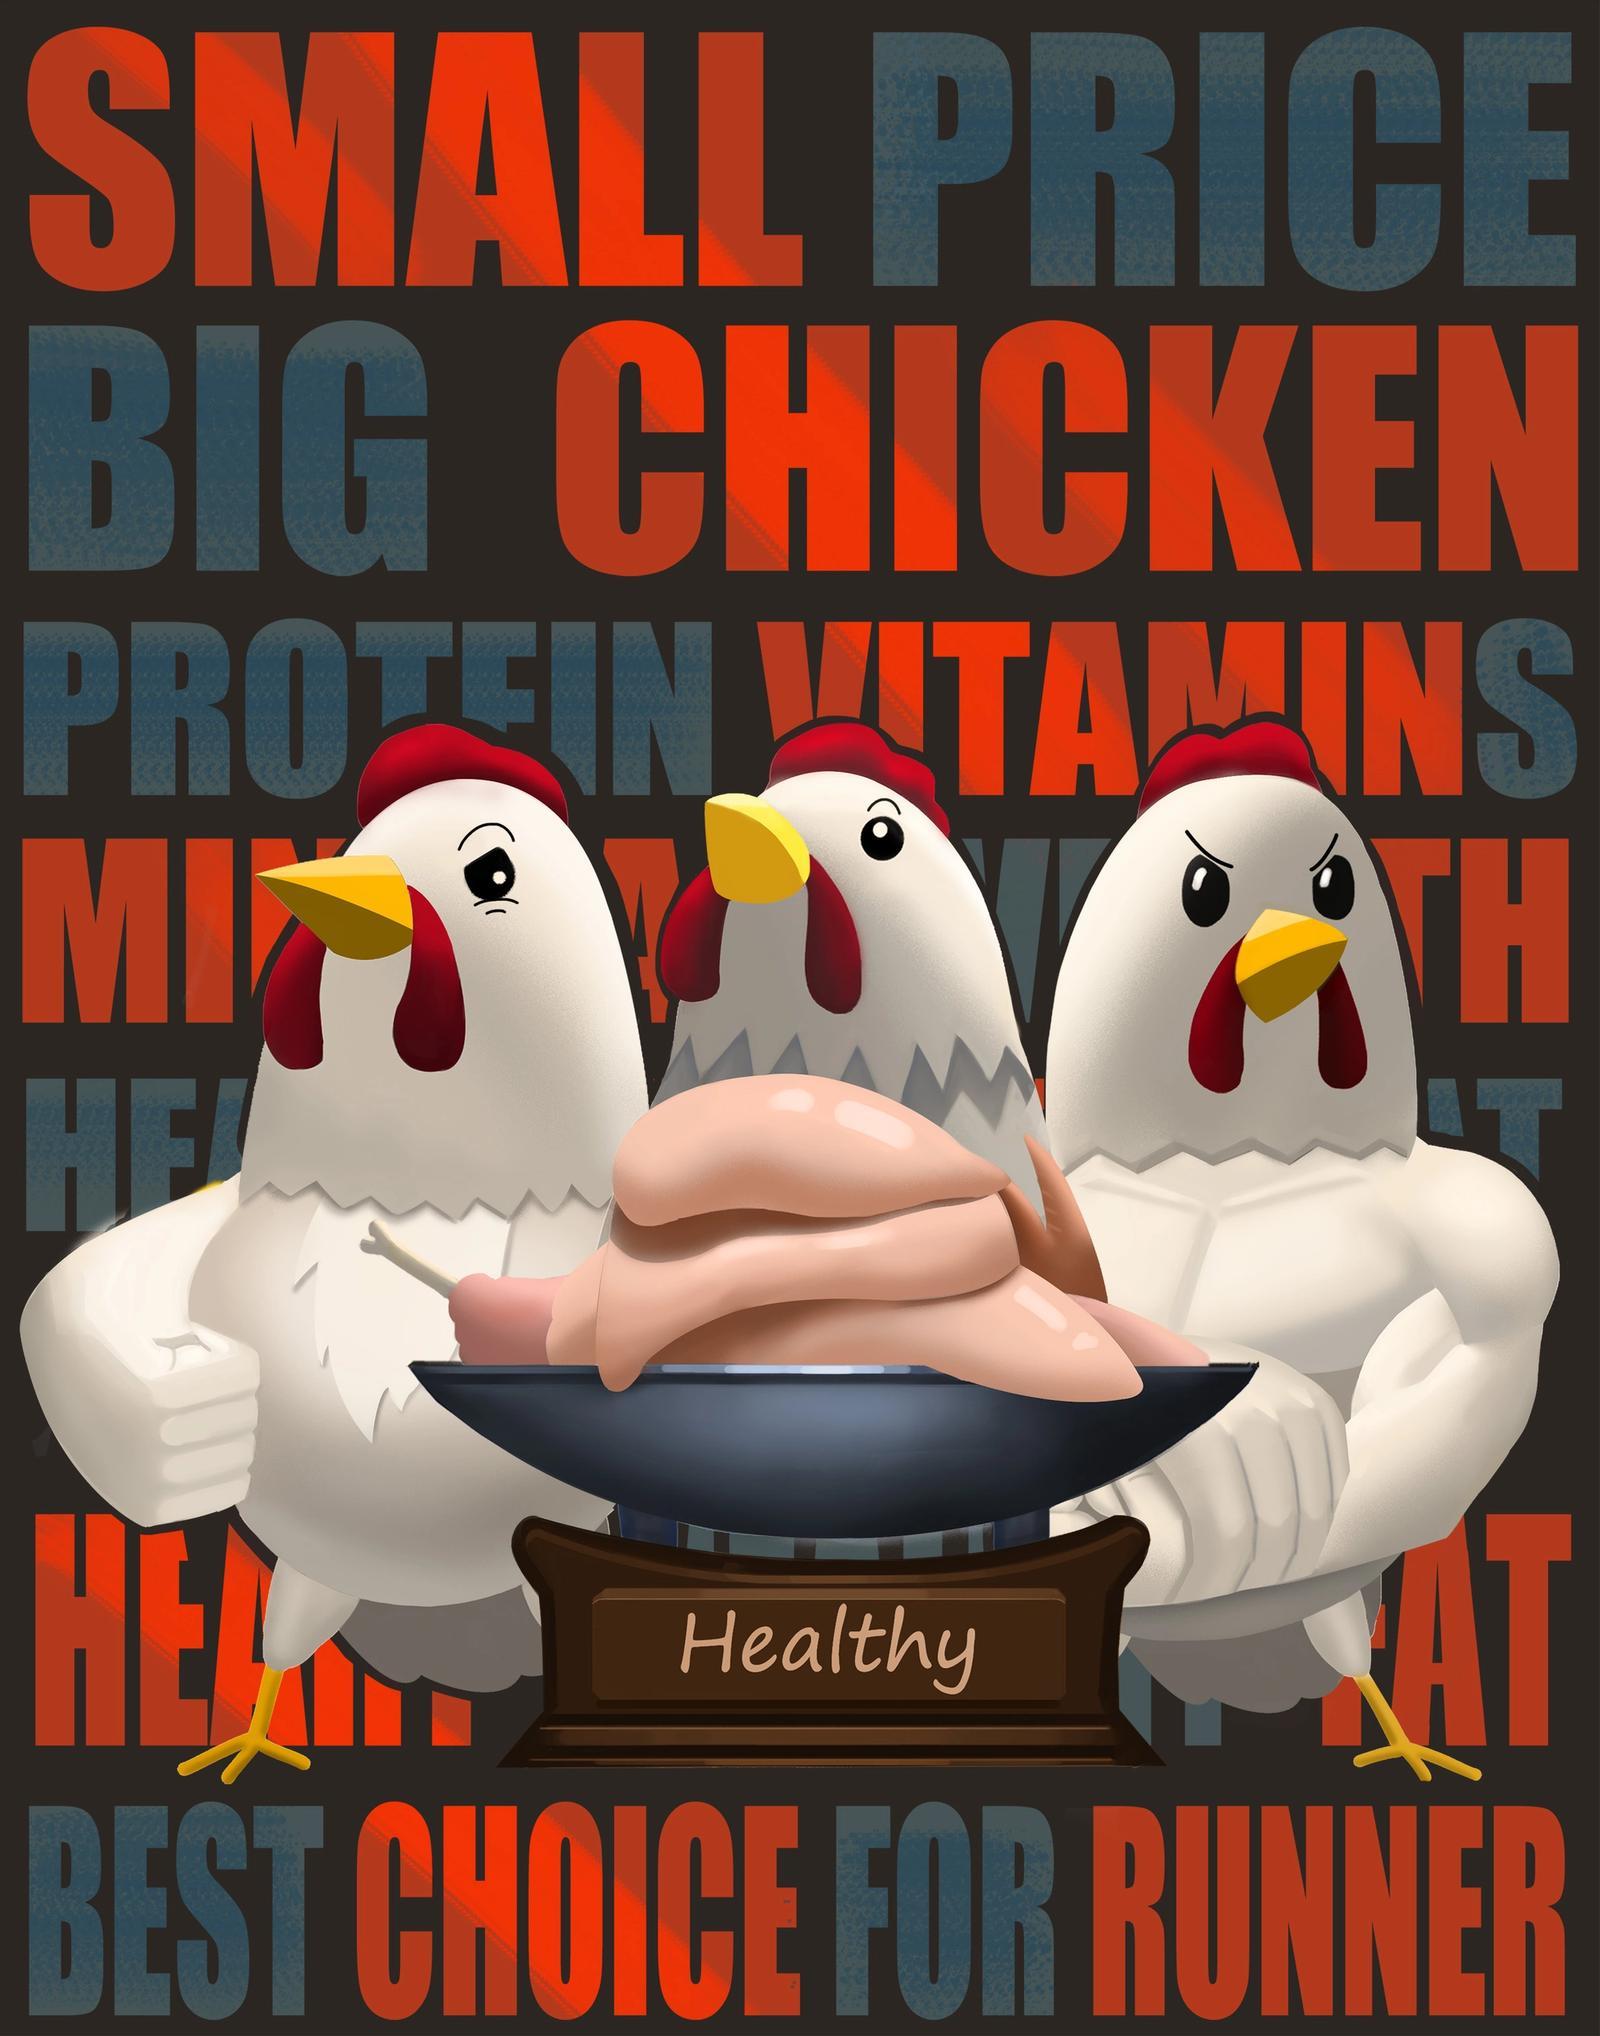 Small Price Big Chicken